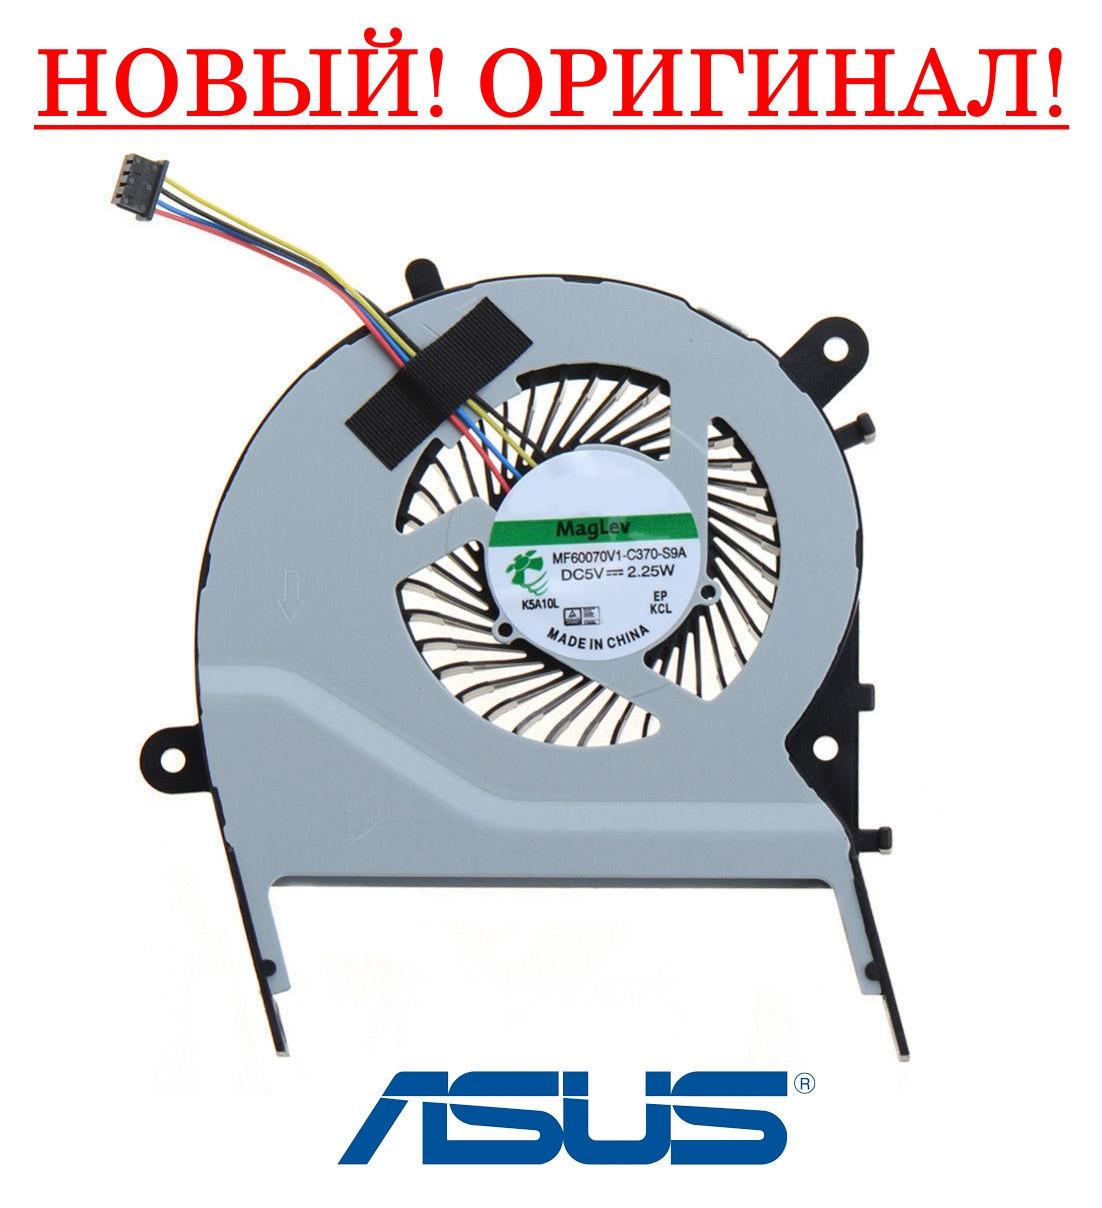 Оригинальный вентилятор (кулер, FAN) для ноутбука ASUS X555SJ, X555UA, X555UB, X555UF